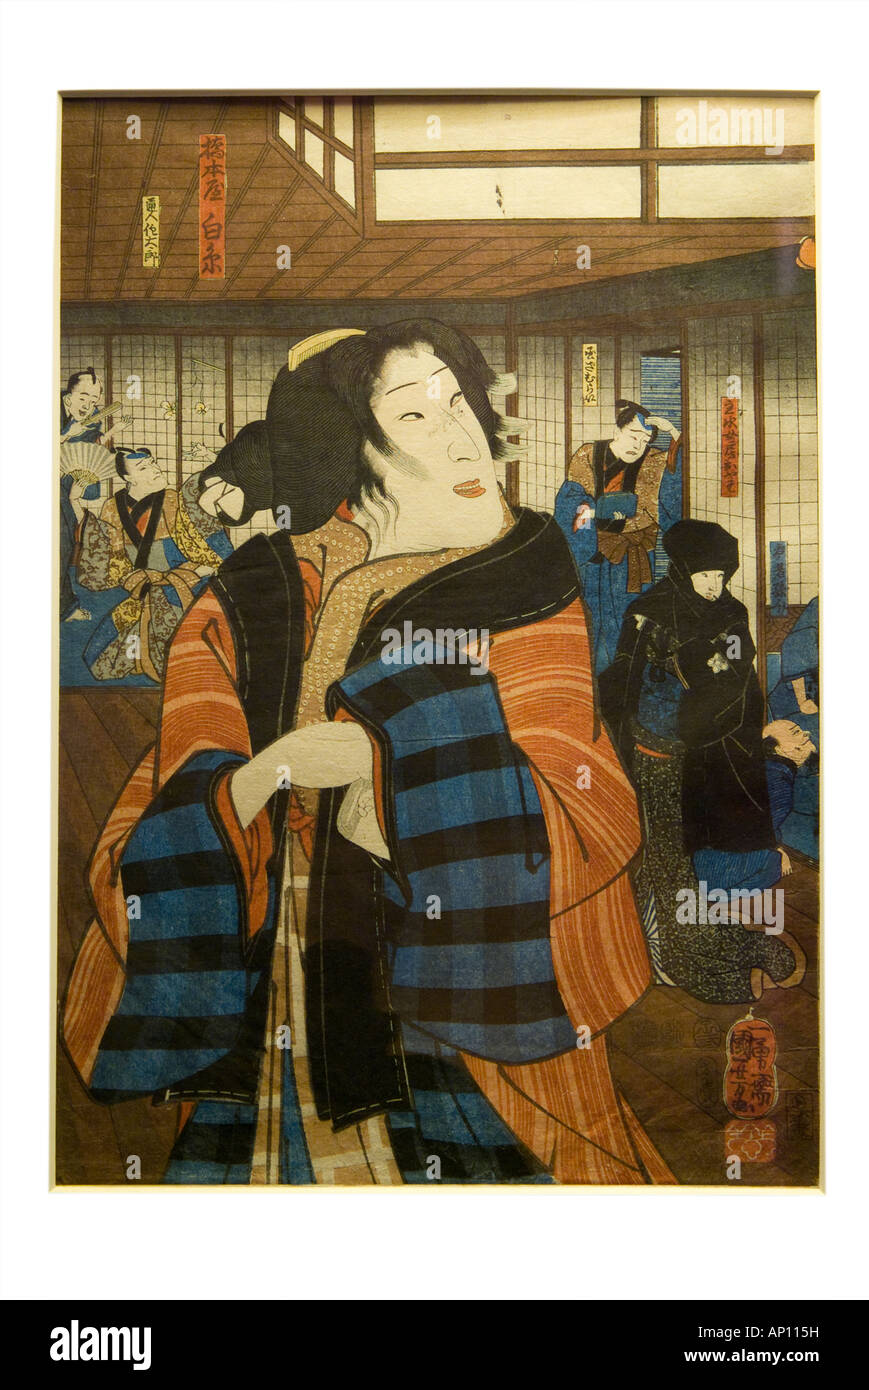 Utagawa kuniyoshi bando shuka Japan Japanese orient oriental print woodblock printing1797 1861great master ukiyo - Stock Image